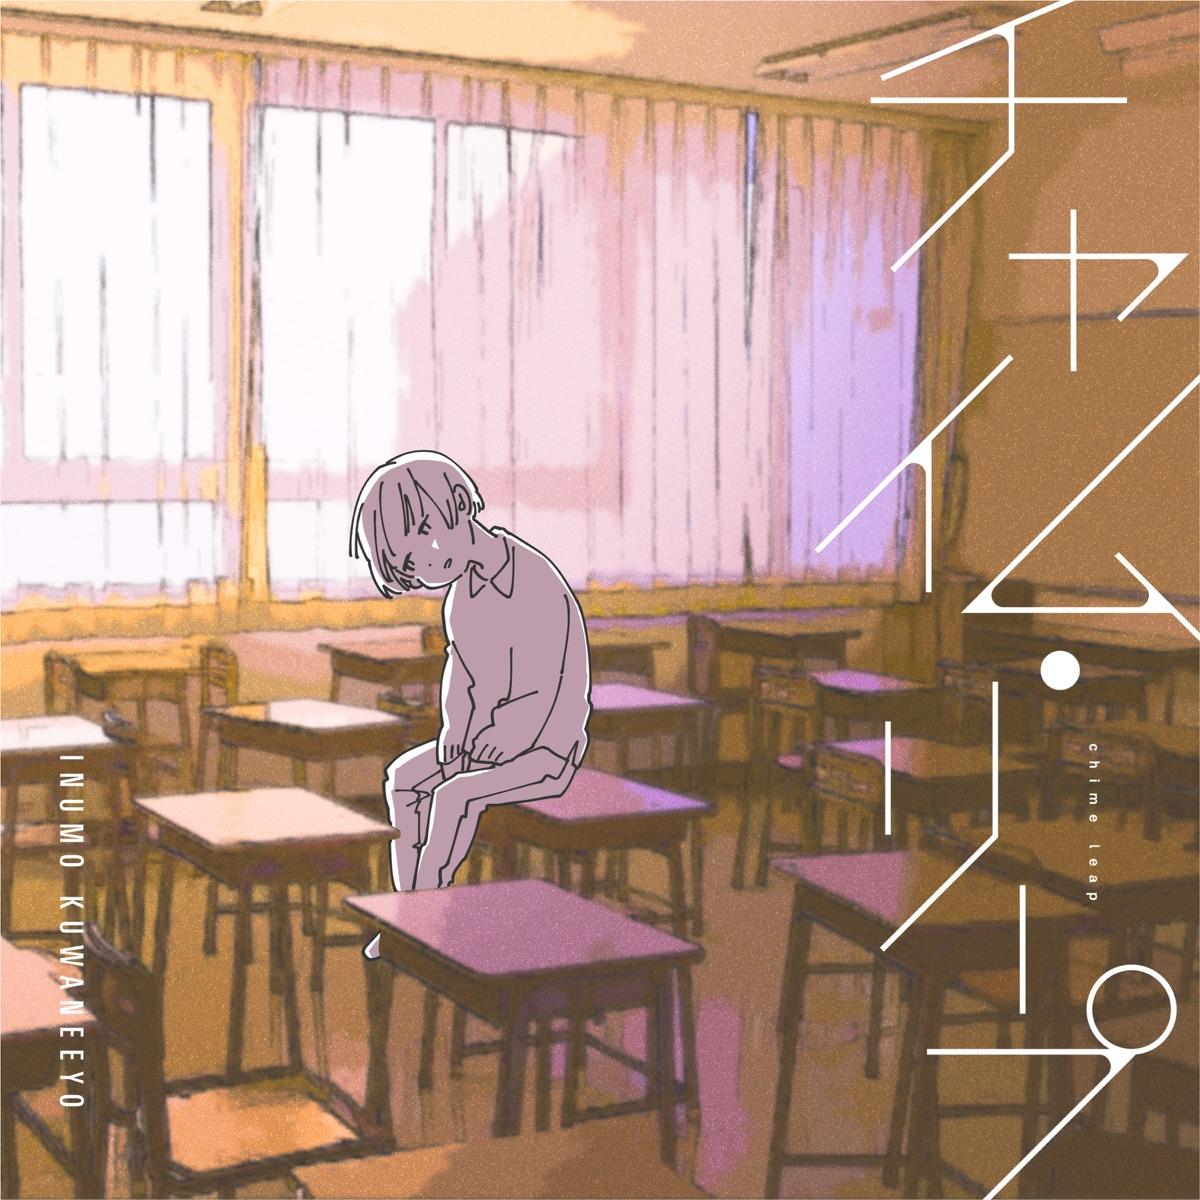 『INUMO KUWANEEYO - チャイム・リープ』収録の『チャイム・リープ』ジャケット